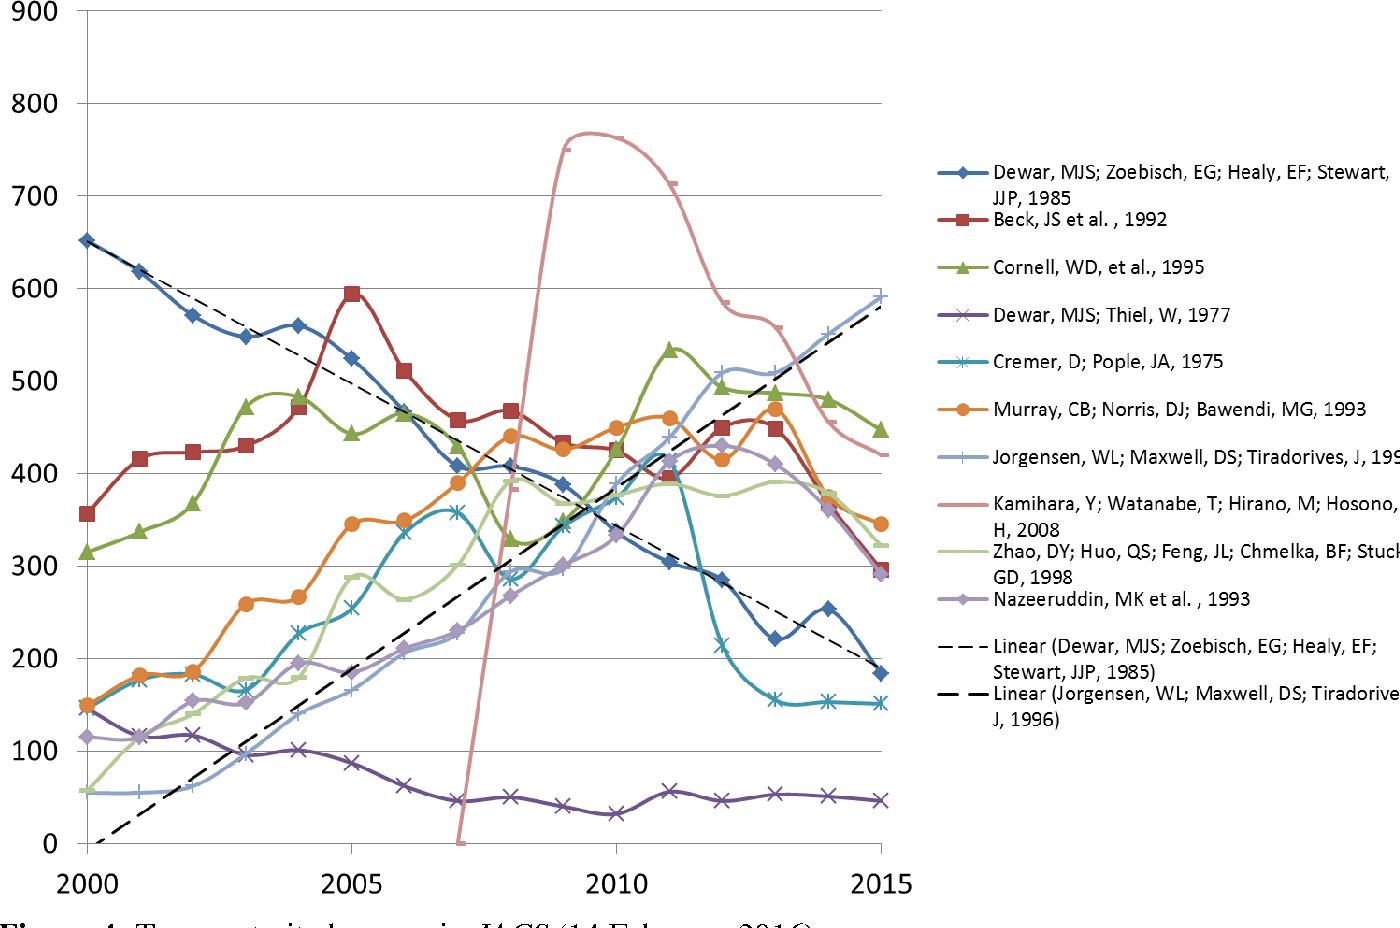 PDF] Citations: Indicators of Quality? The Impact Fallacy - Semantic